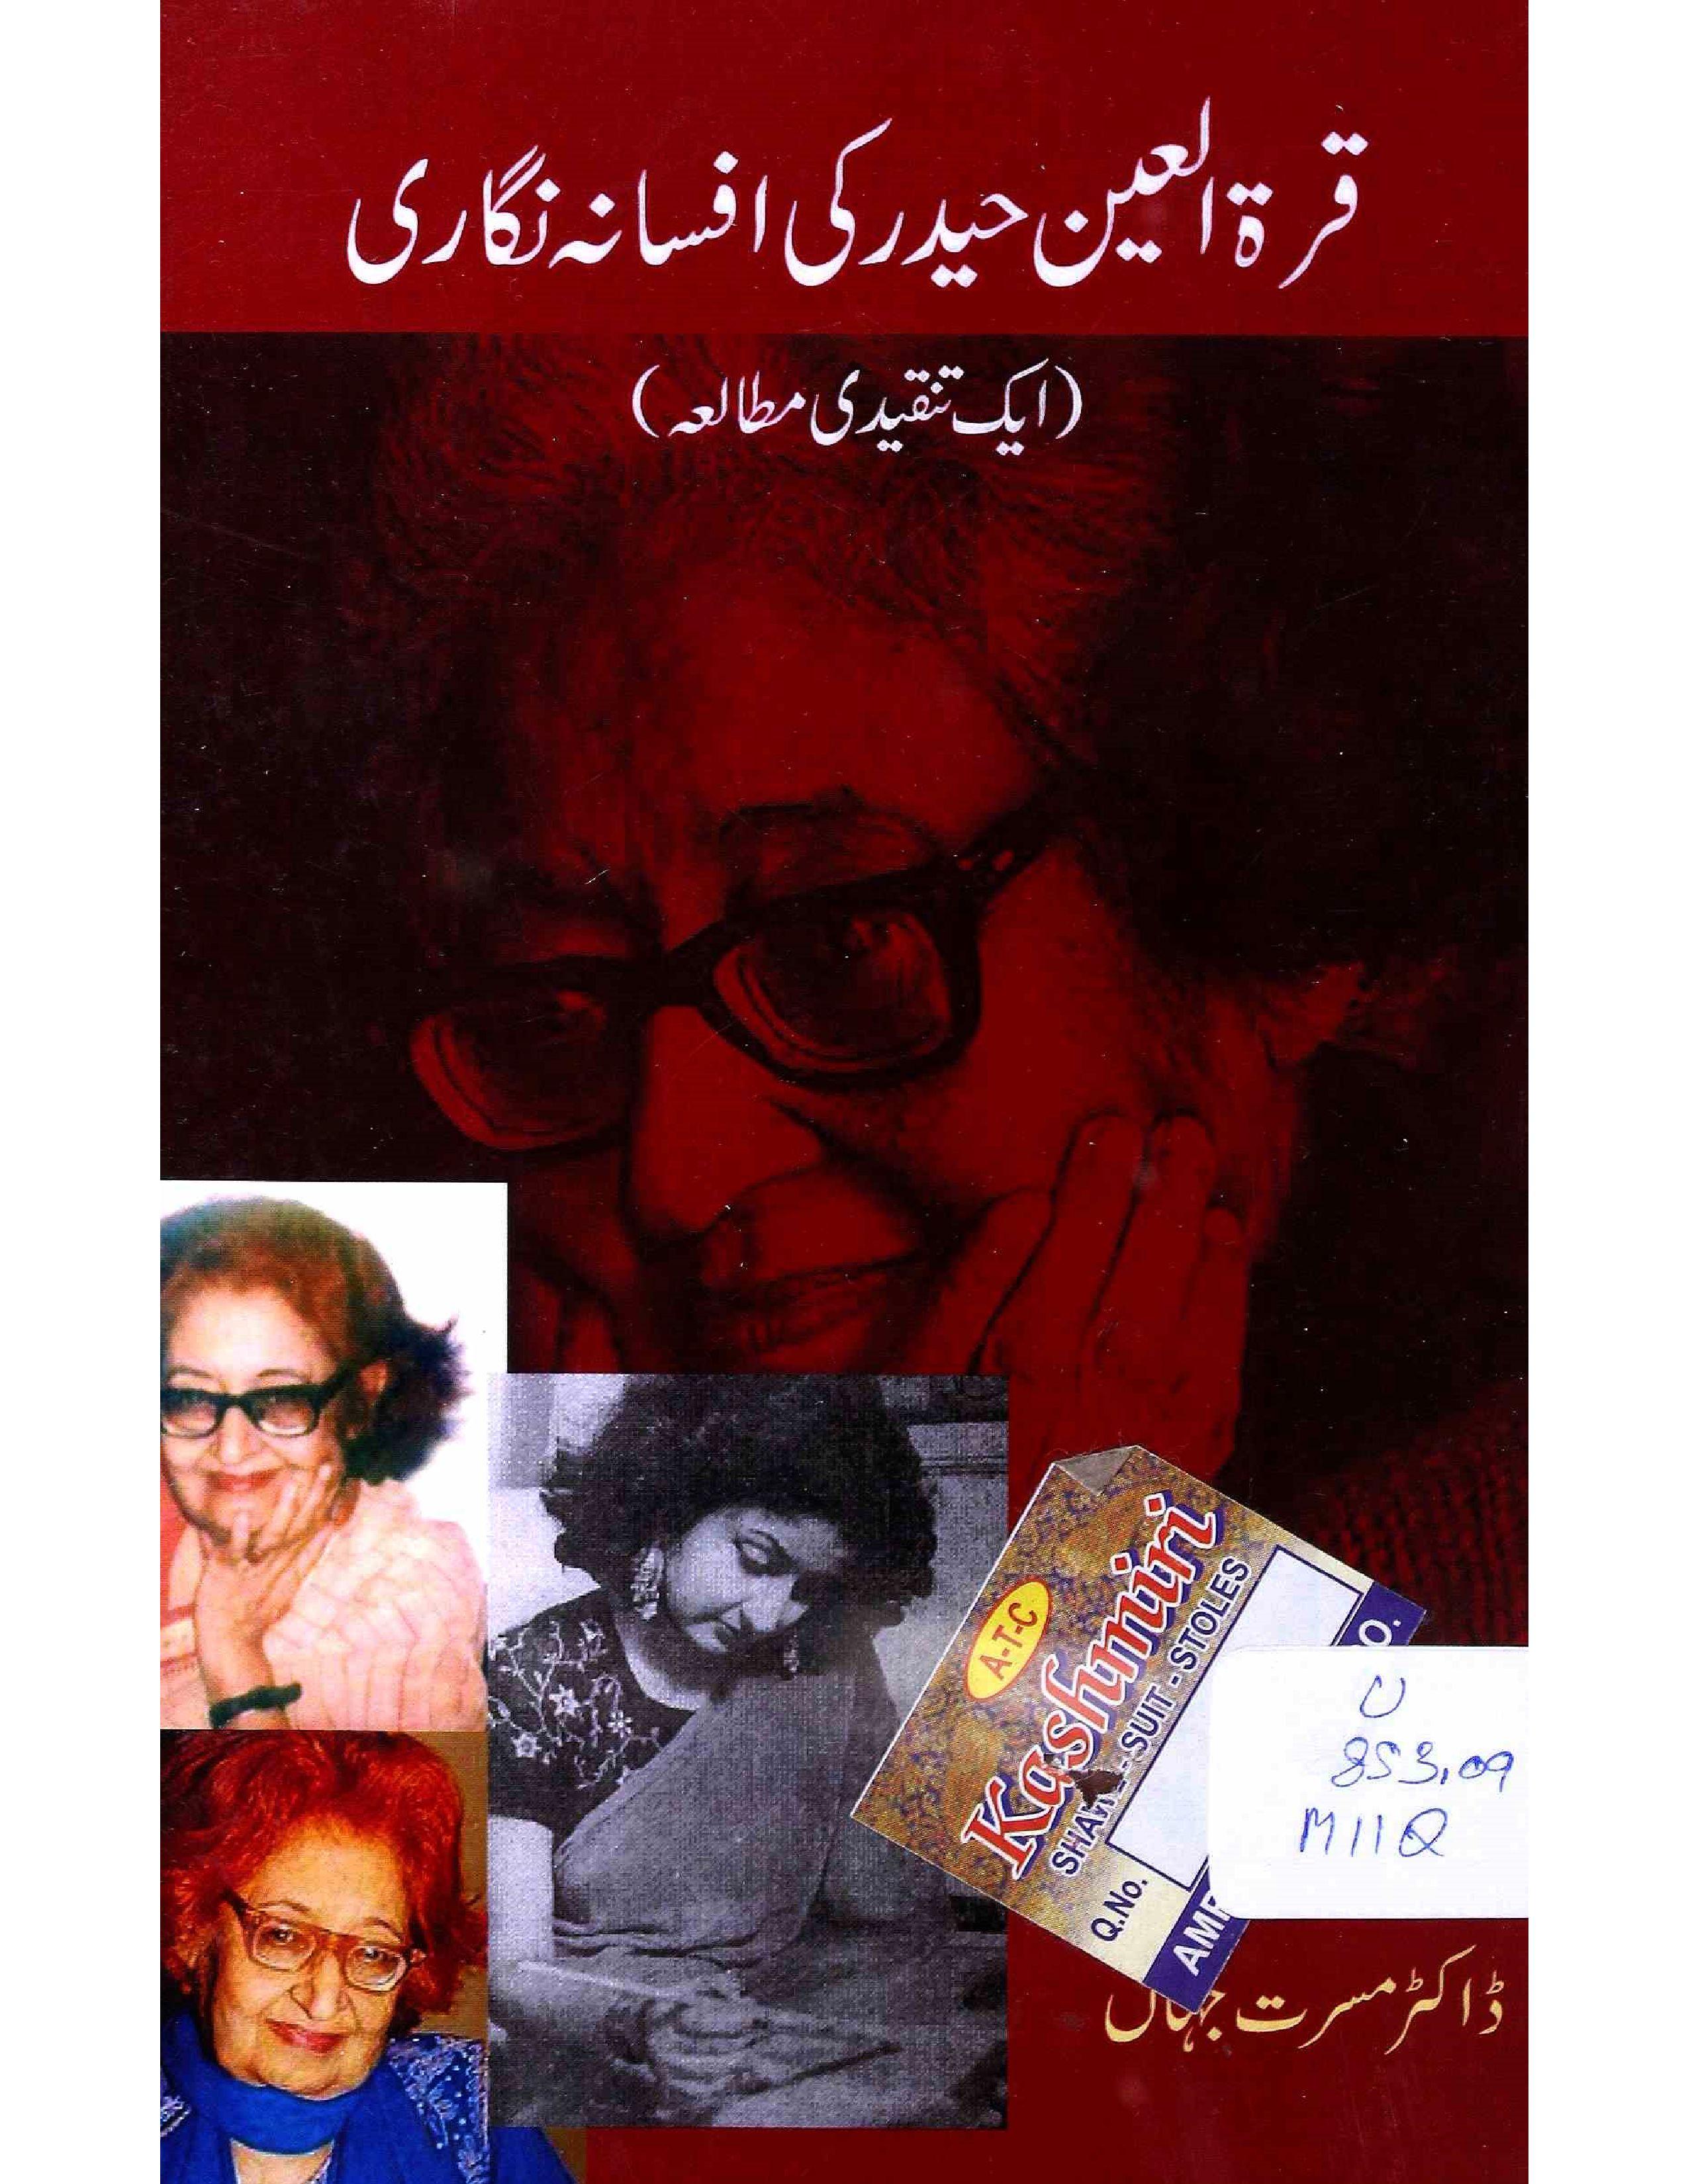 Qurratul-Ain-Haider Ki Afsana Nigari     Ek Tanqueedi Motalea